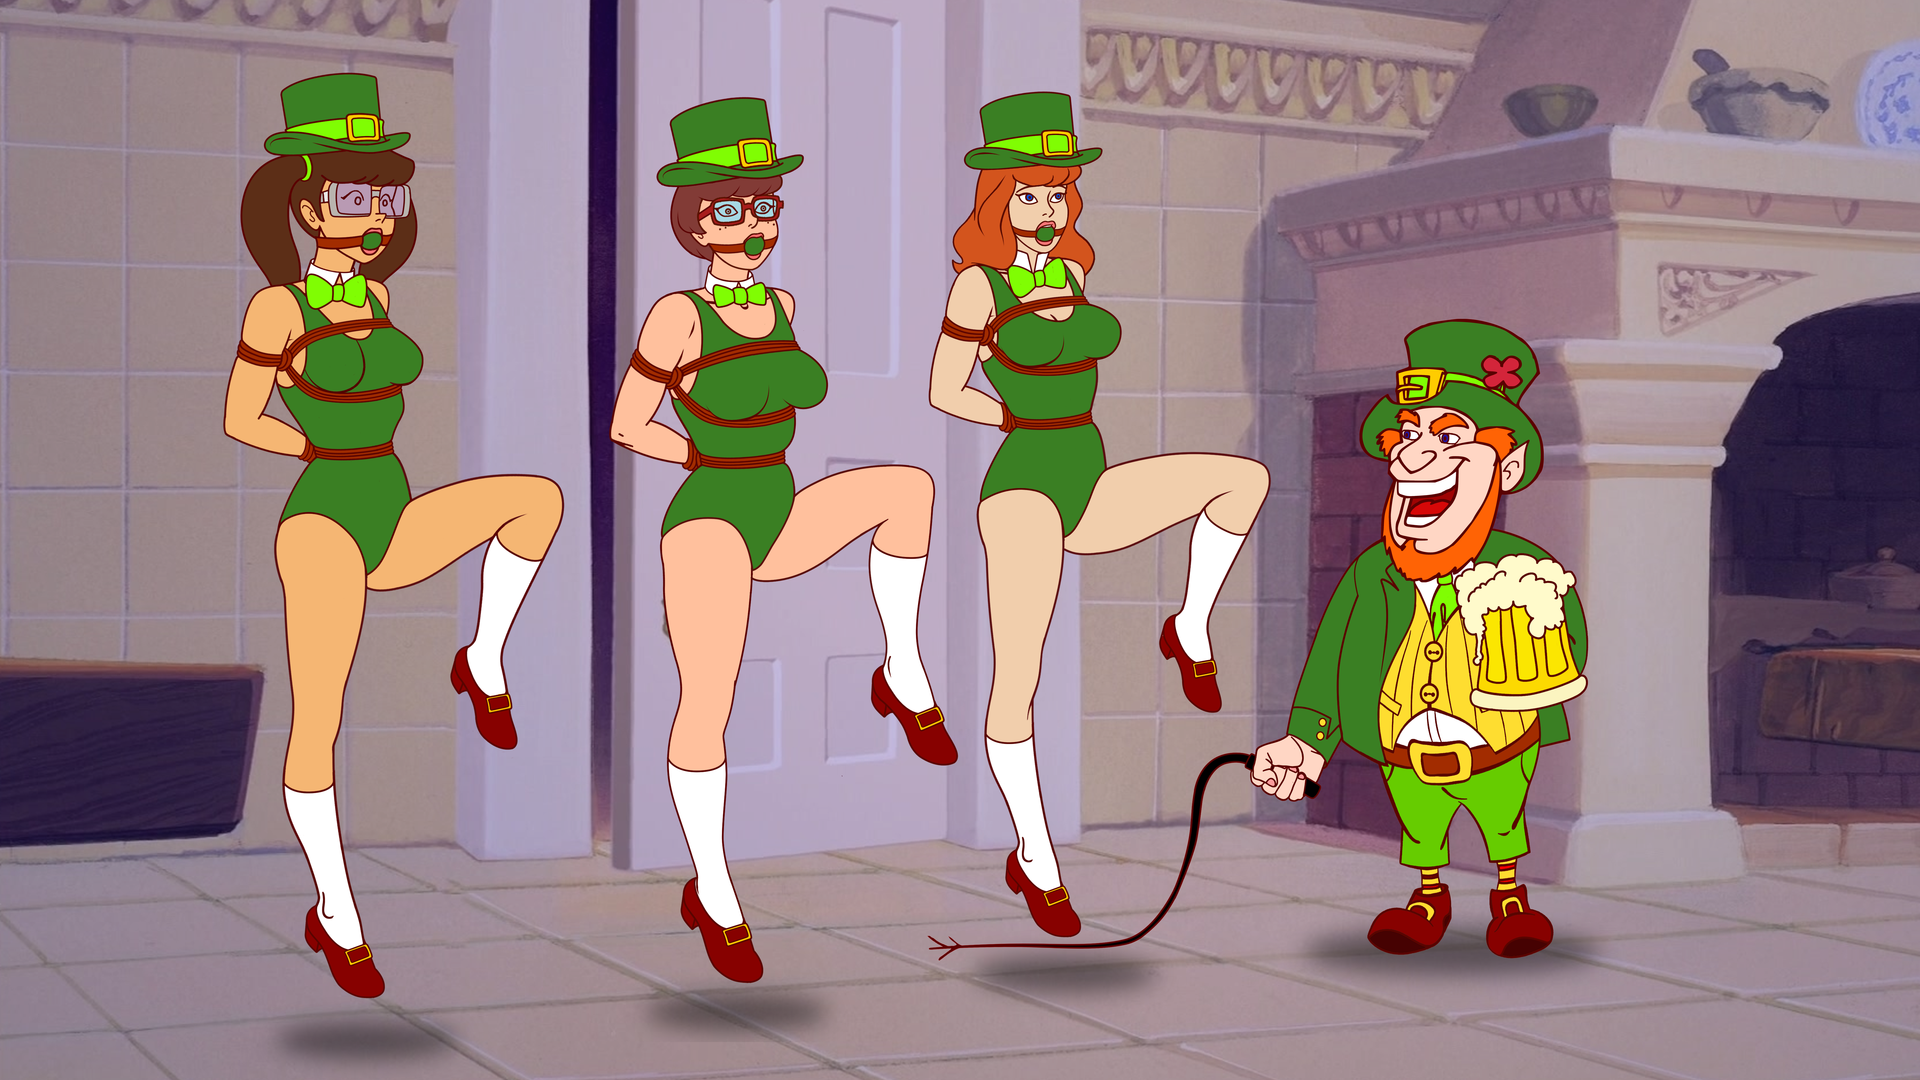 Daphne Velma and Madelyn Dance Irish Jig by VictorZulu